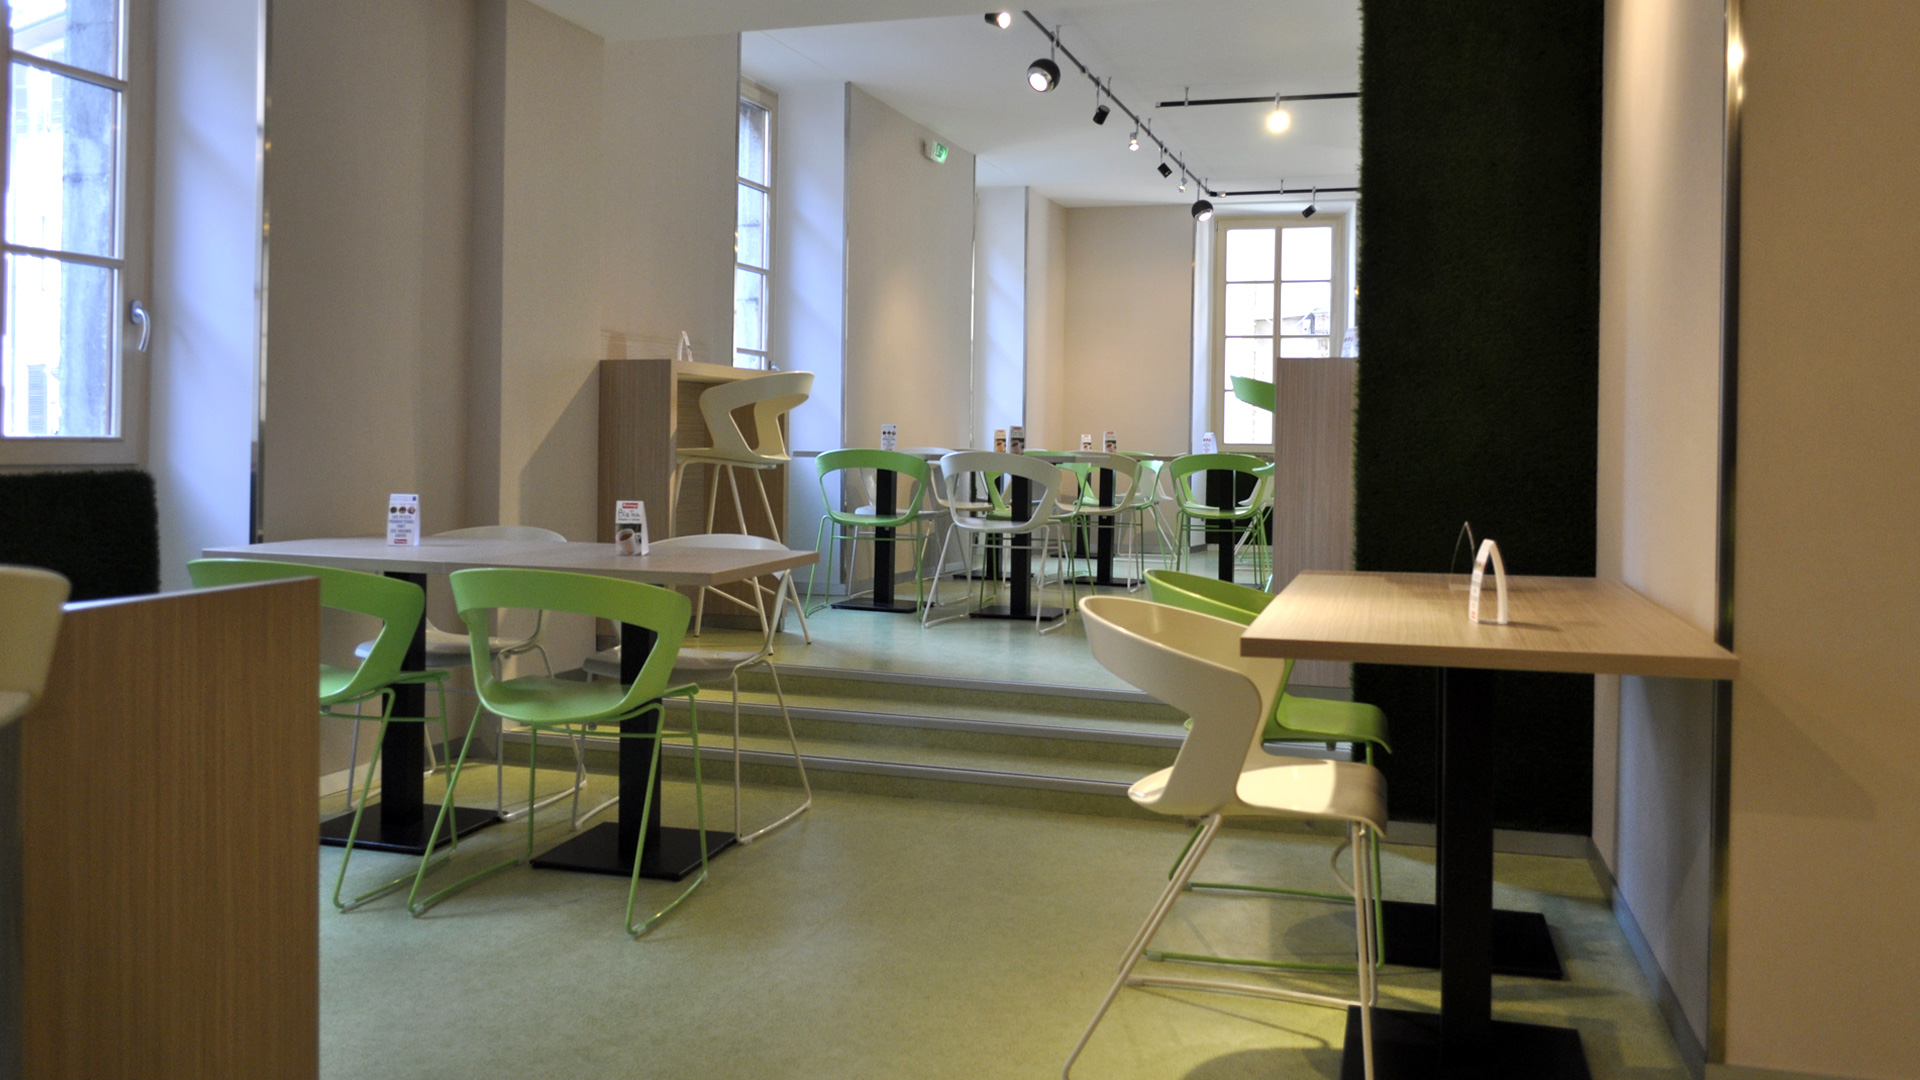 Concept restauration rapide -Rue du Paquier - Annecy